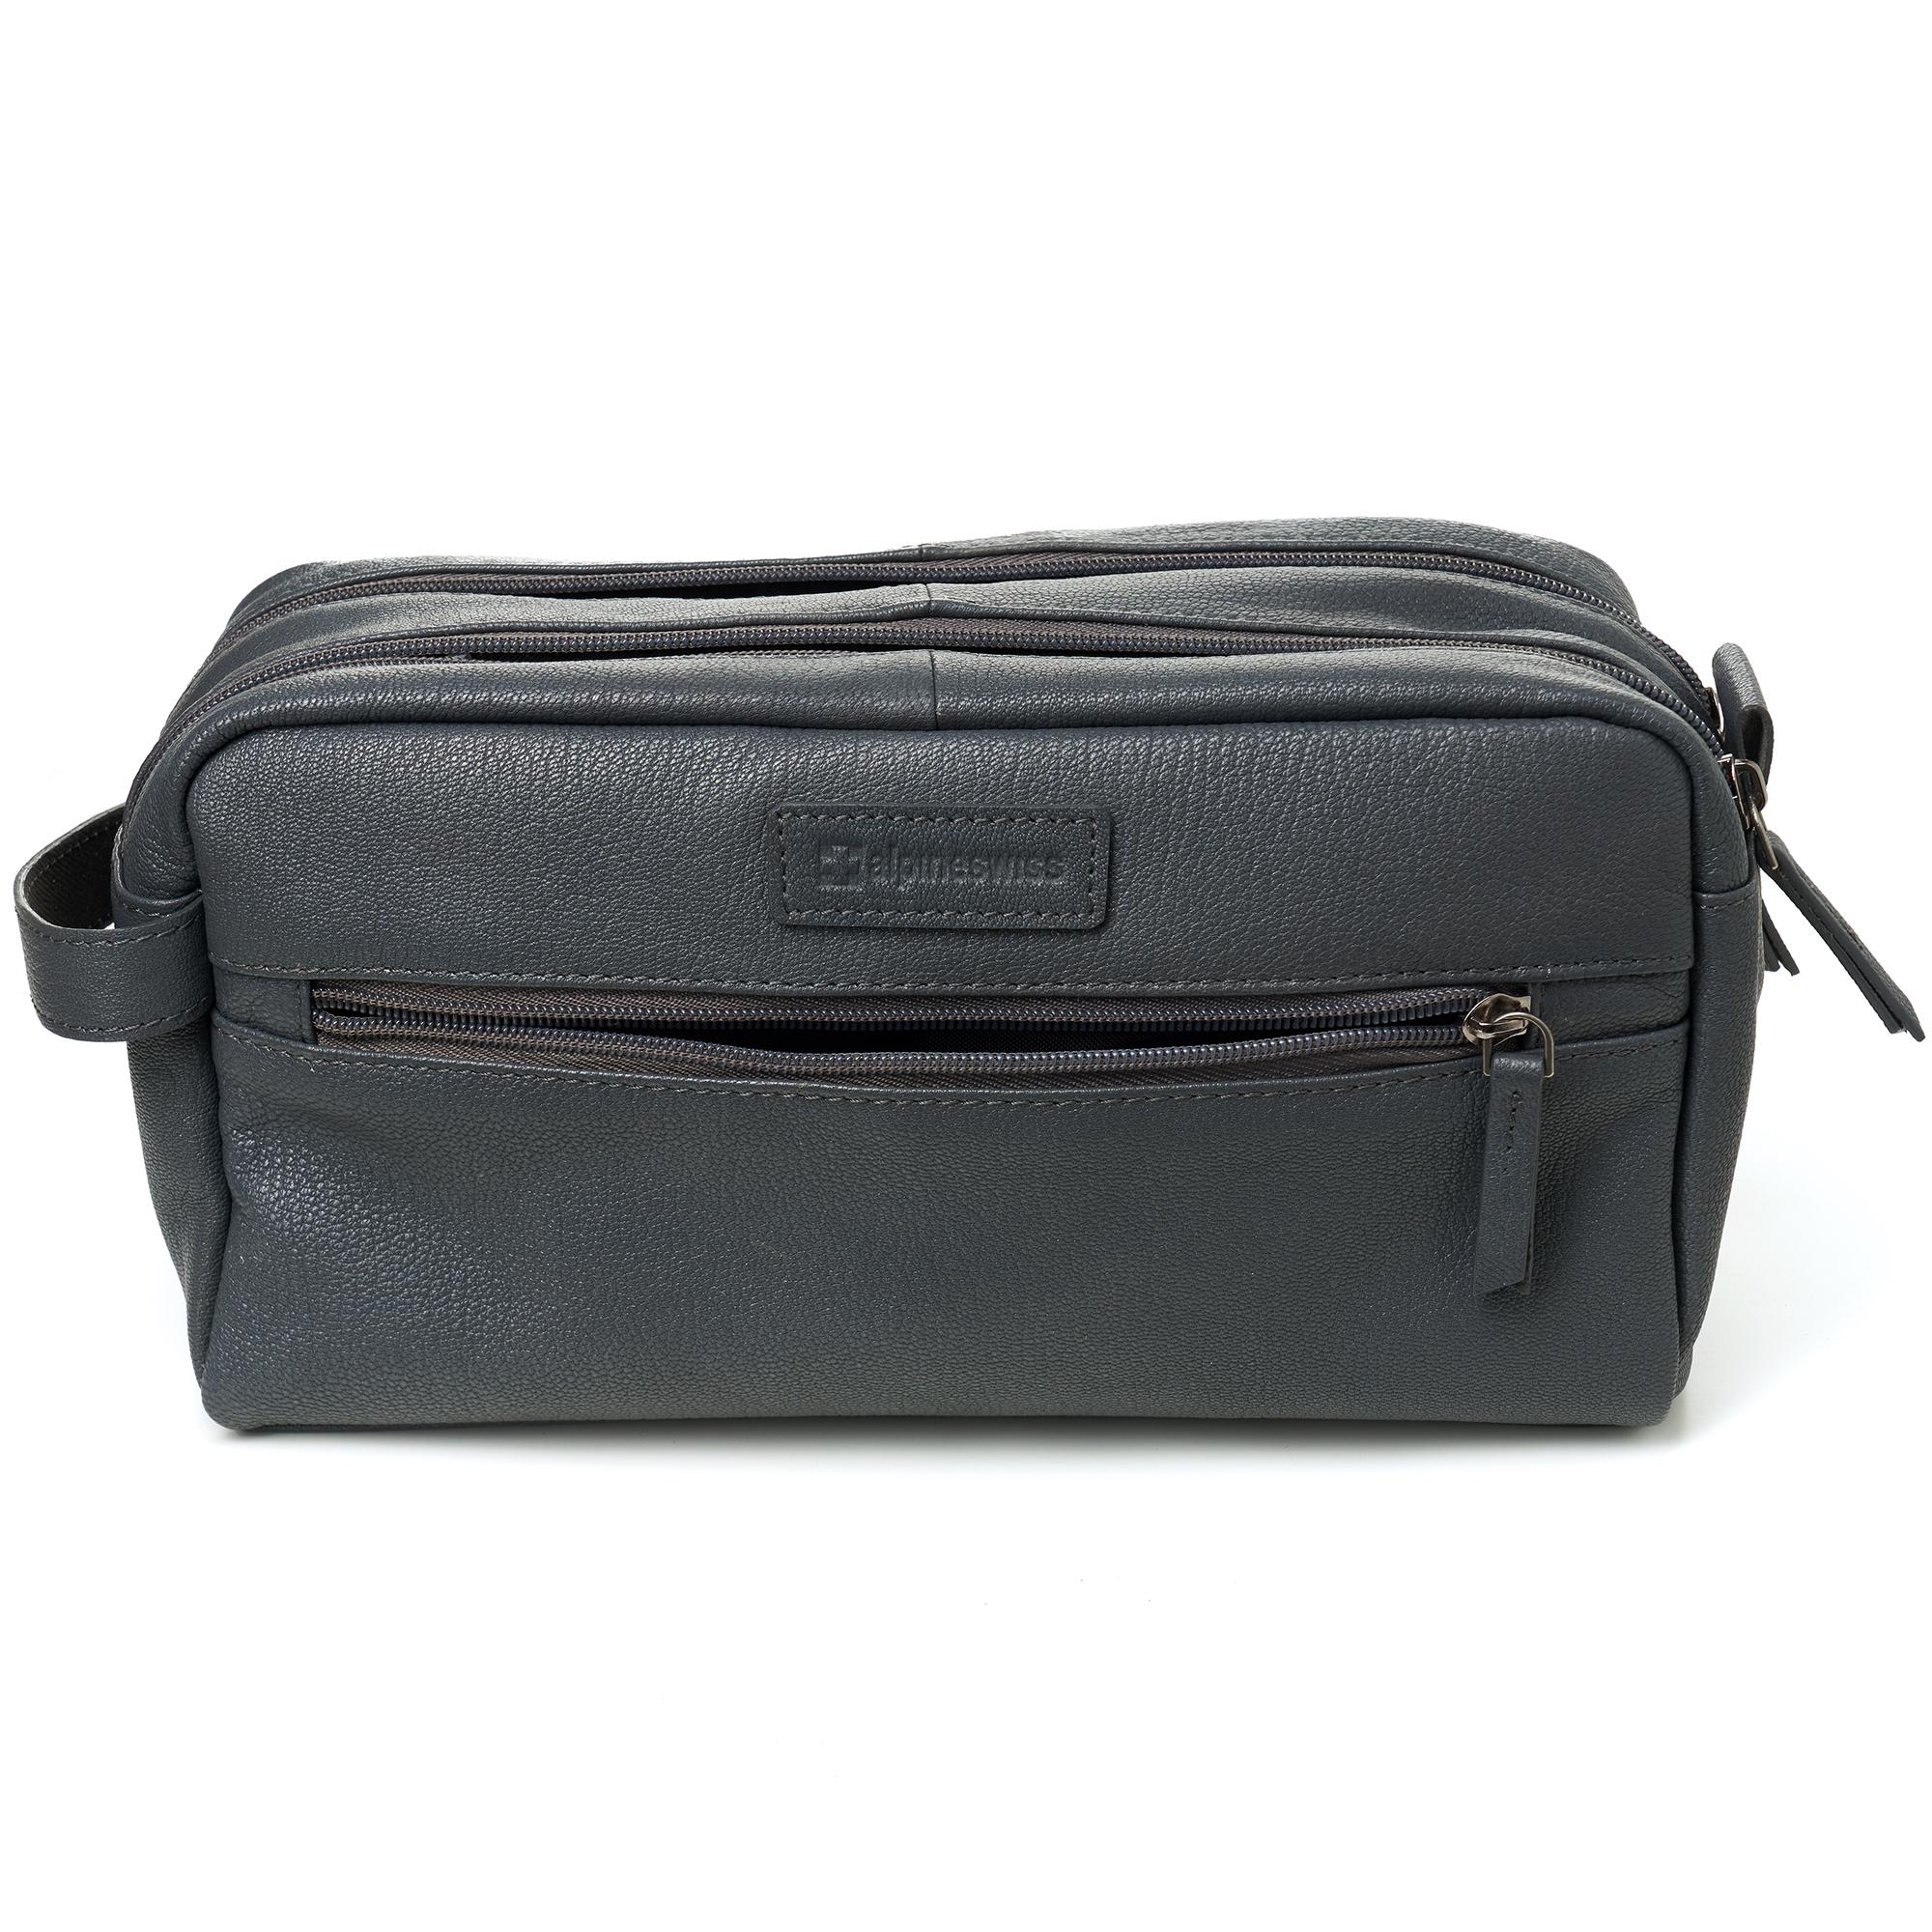 AlpineSwiss-Sedona-Toiletry-Bag-Genuine-Leather-Shaving-Kit-Dopp-Kit-Travel-Case thumbnail 29